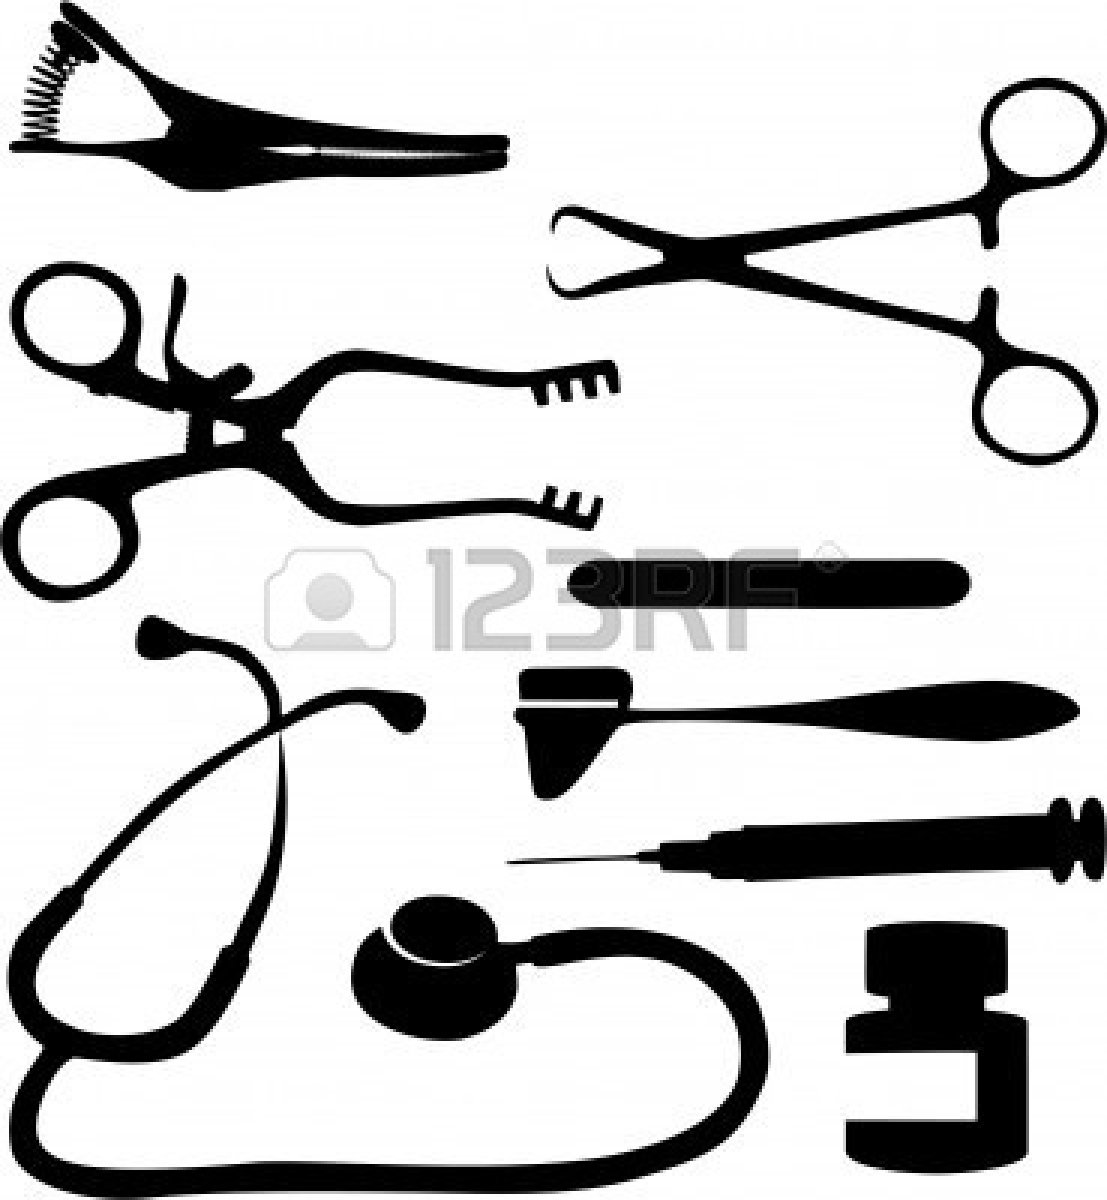 Medical Doctor Logo Clipart